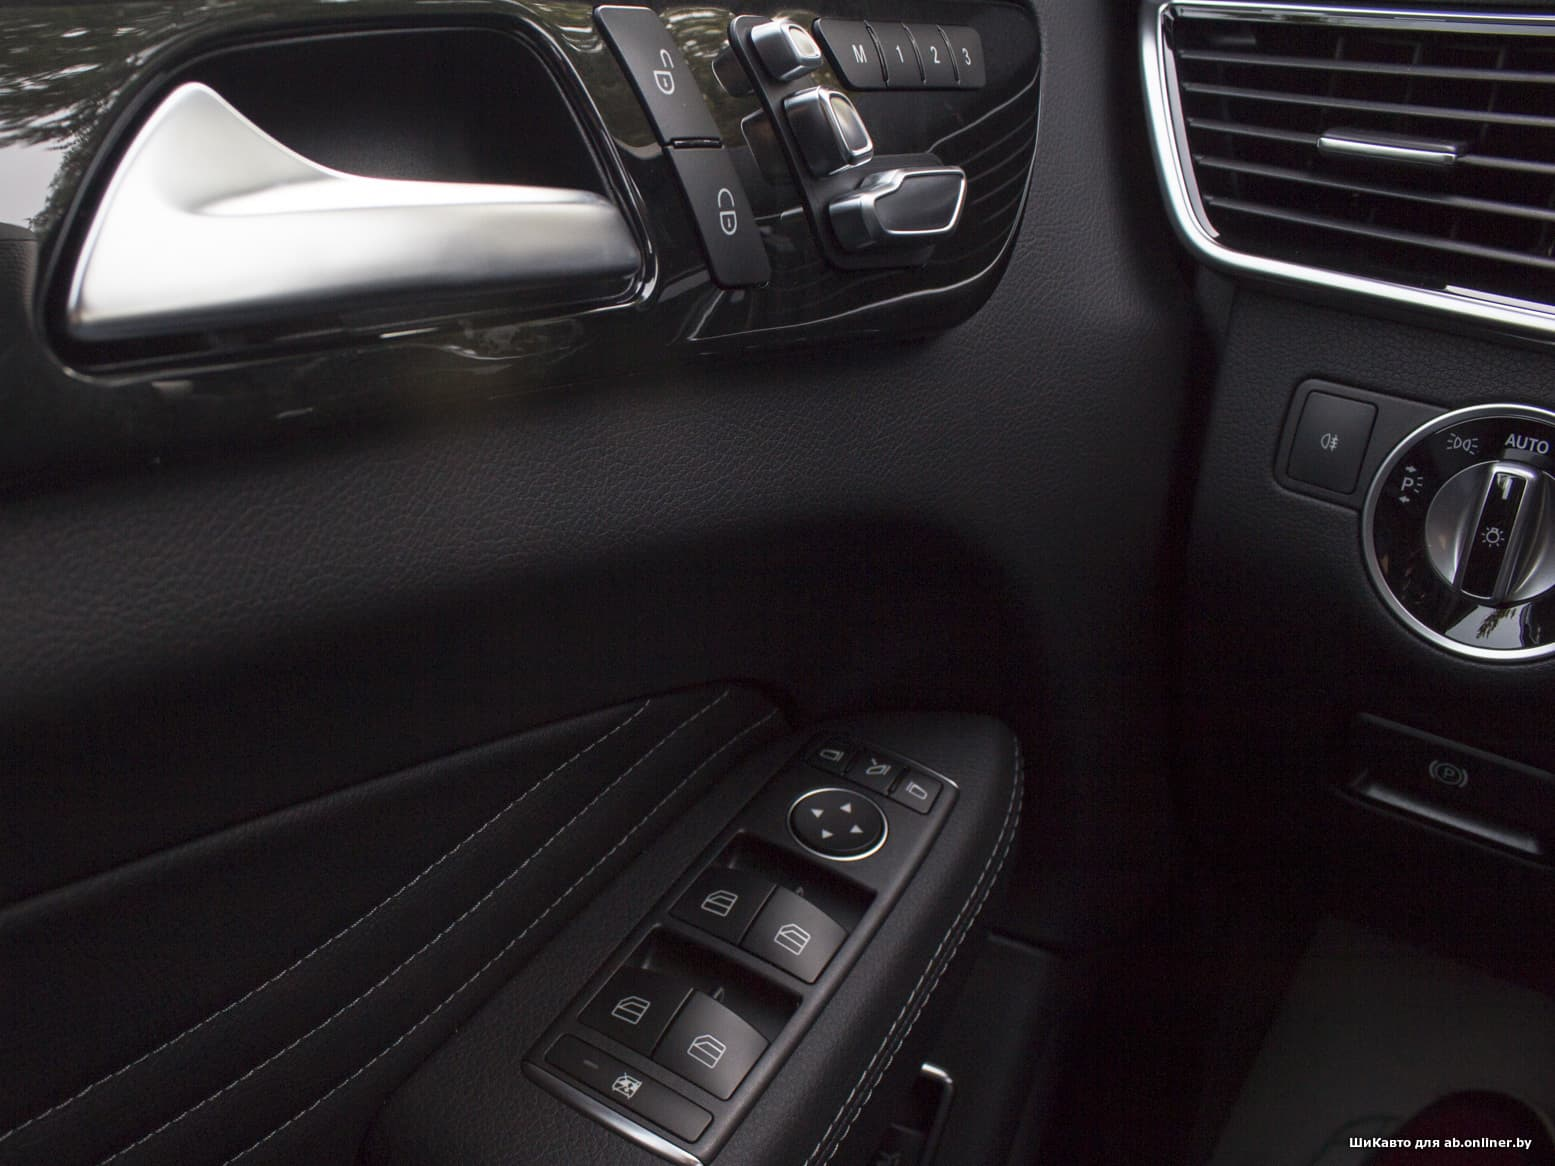 Mercedes-Benz GLE350 D AMG